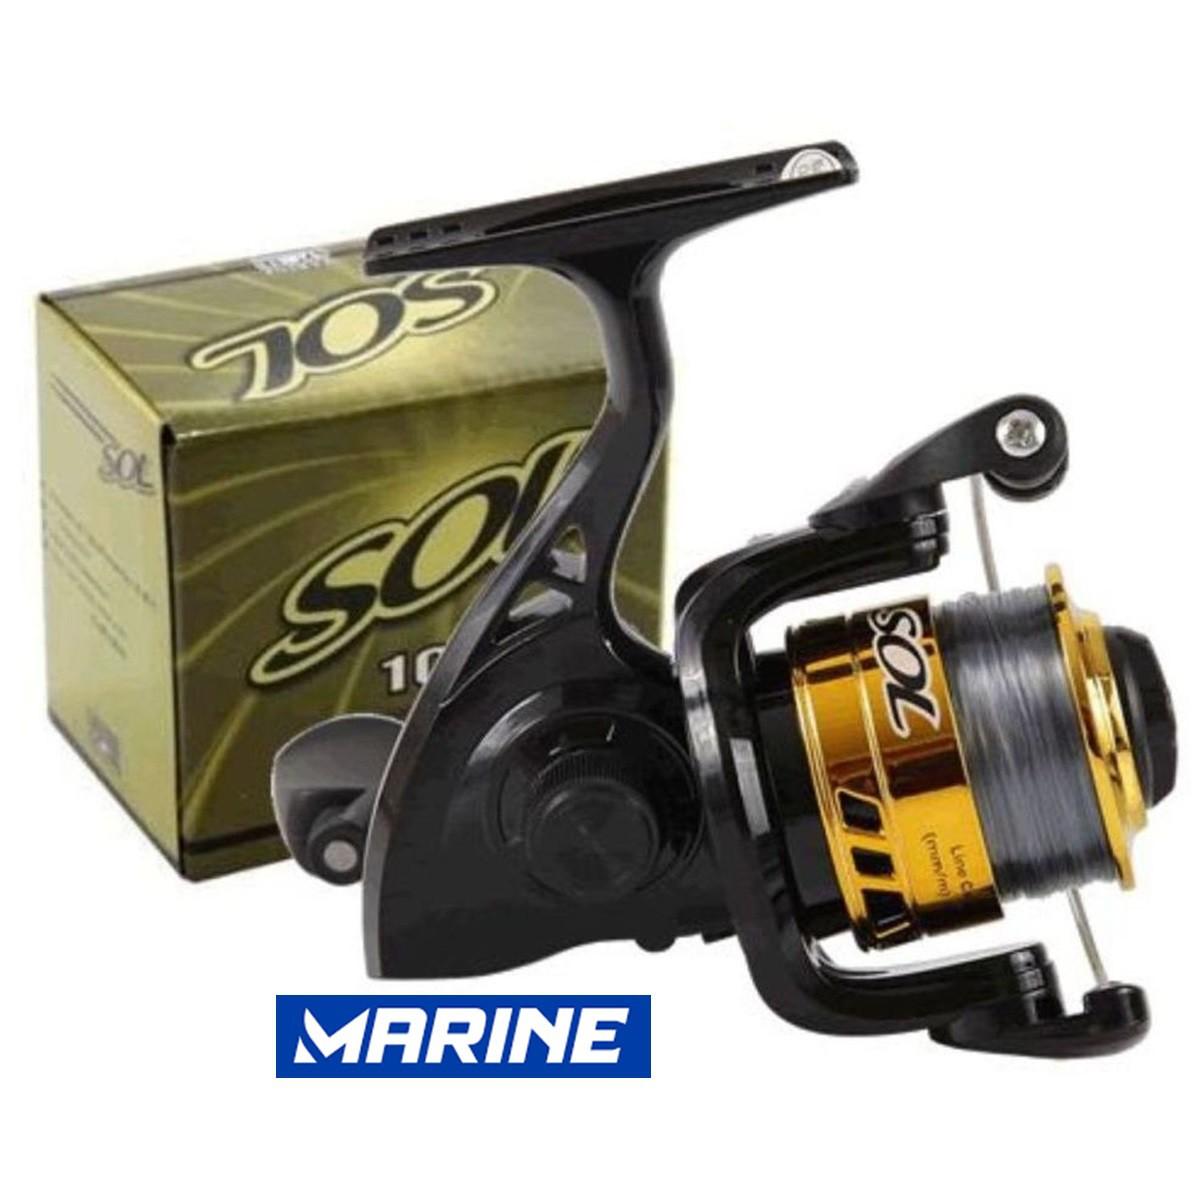 Kit De Pesca Completo Suporta 6kg 3 Vara 3 Molinete E Itens